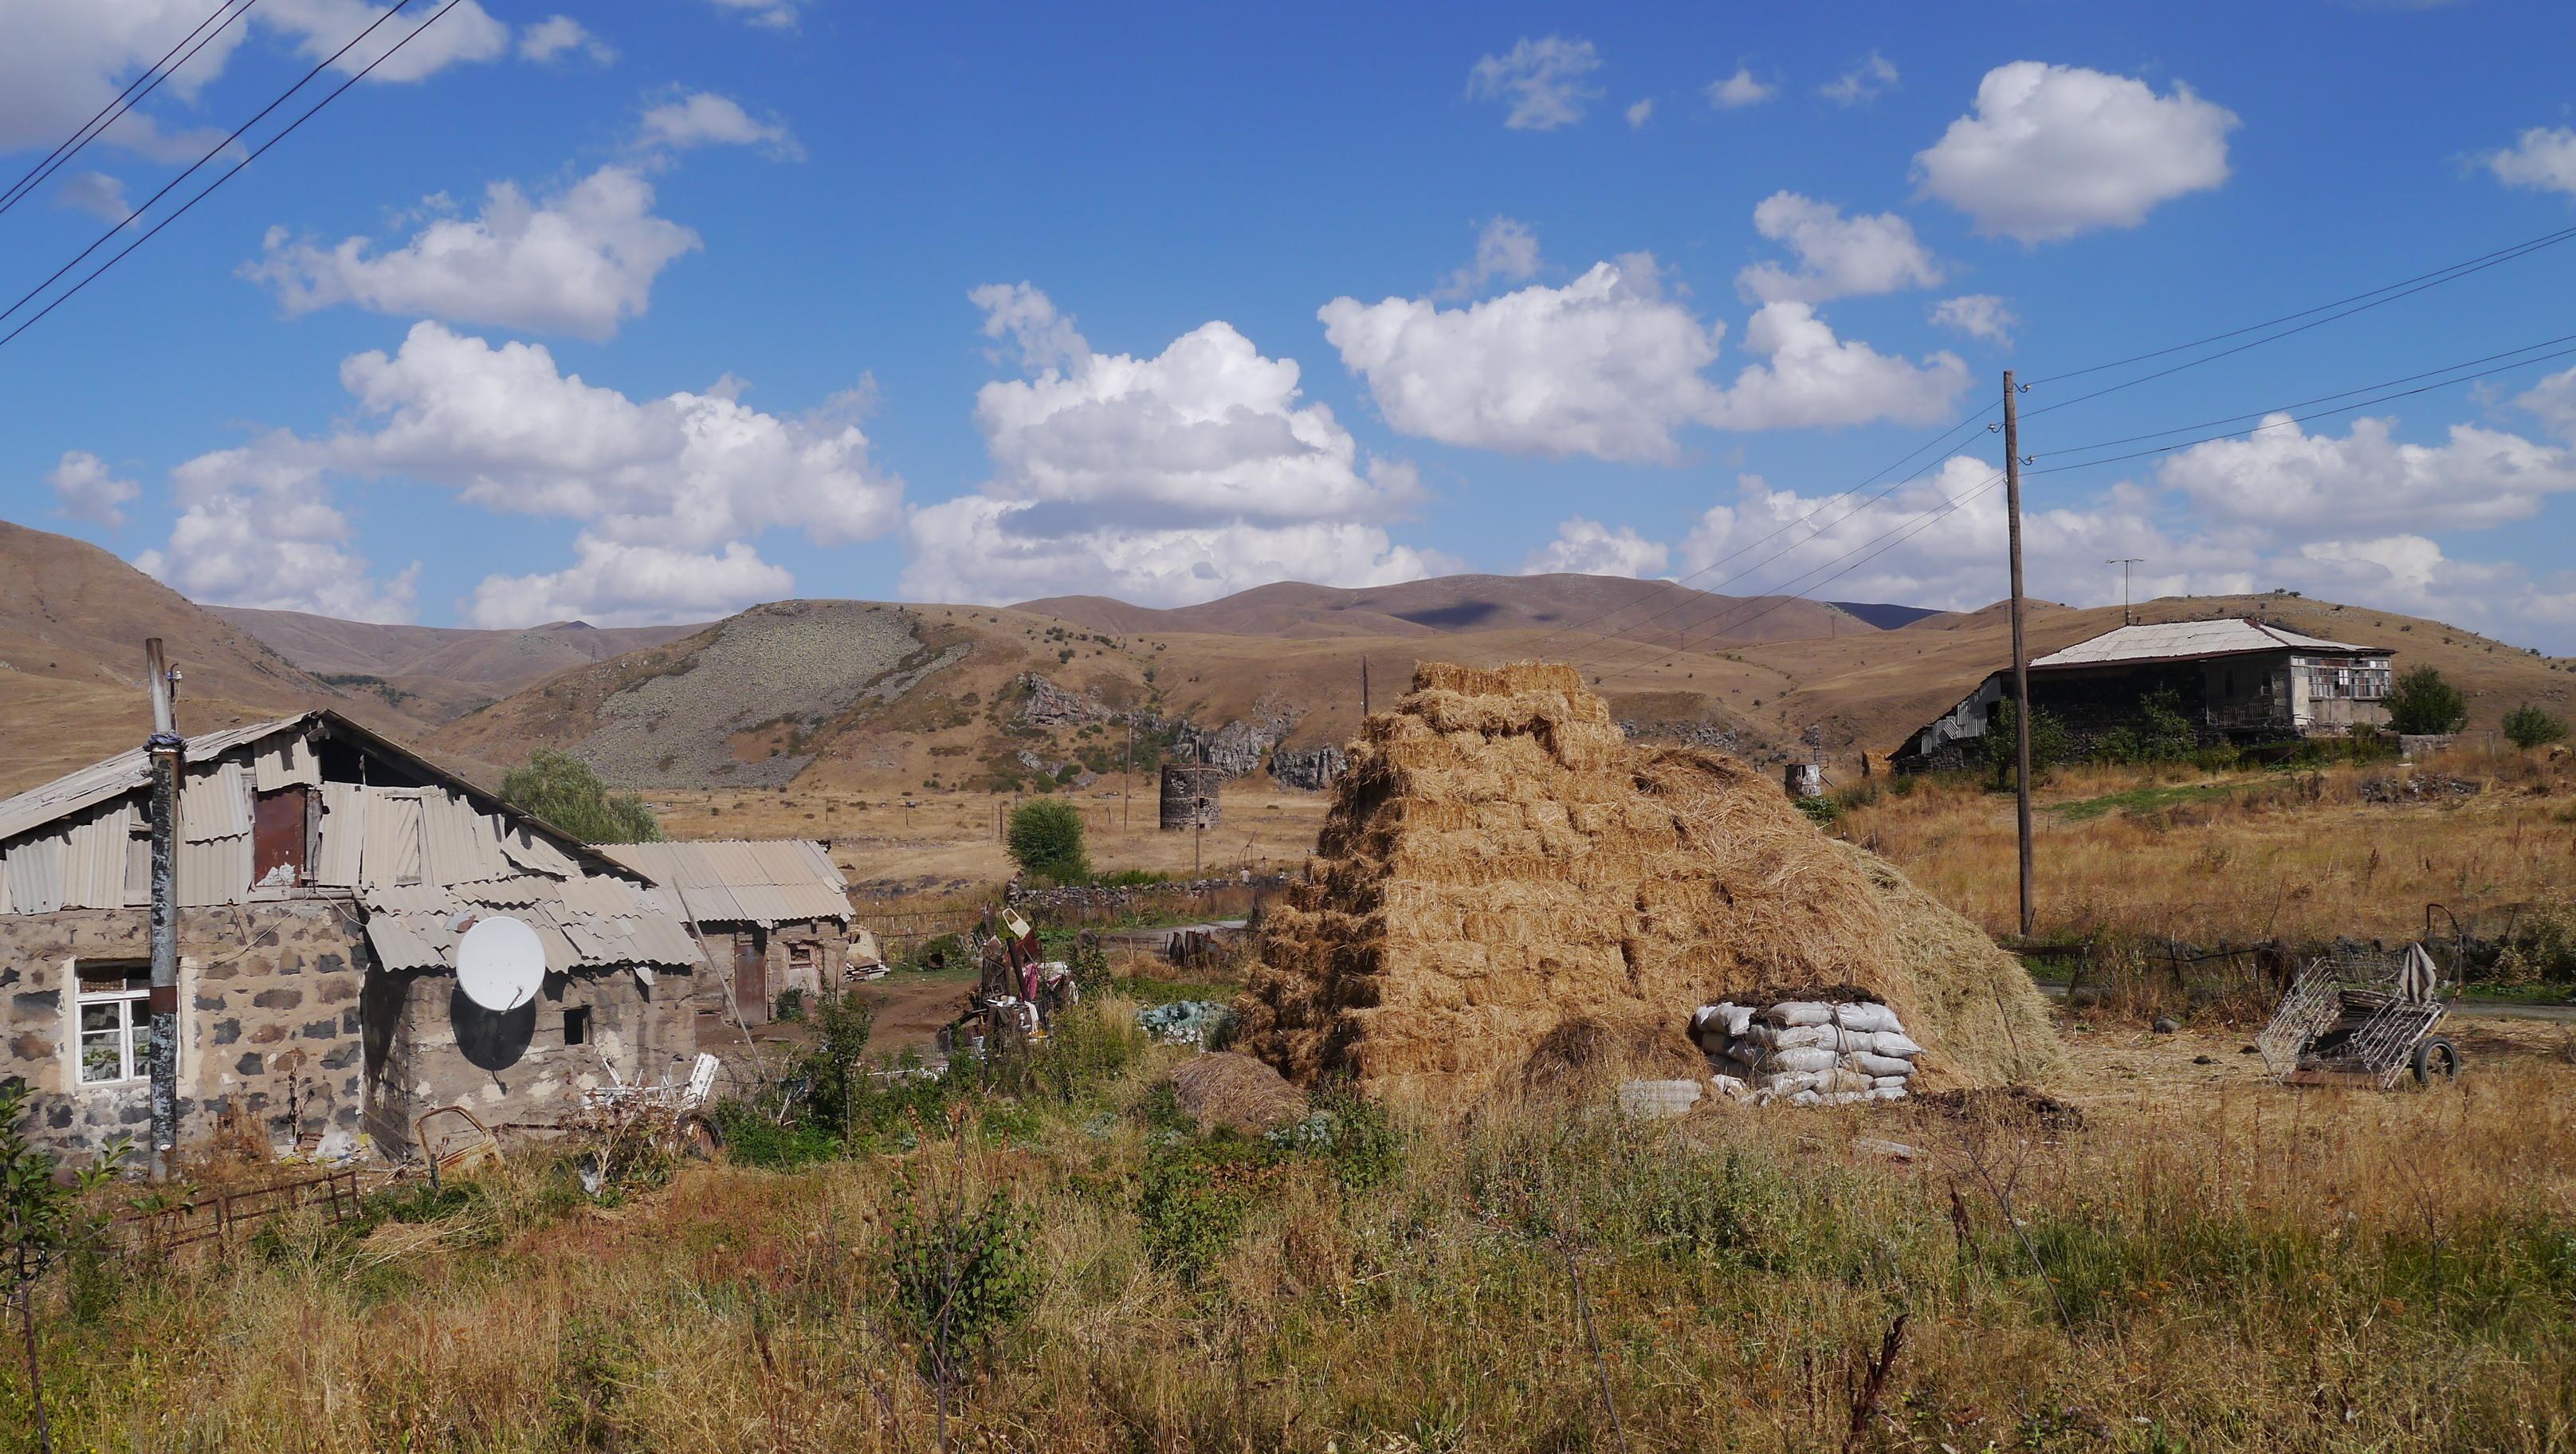 armenie paysage - Recherche Google   Natural landmarks, Mount rushmore, Landmarks